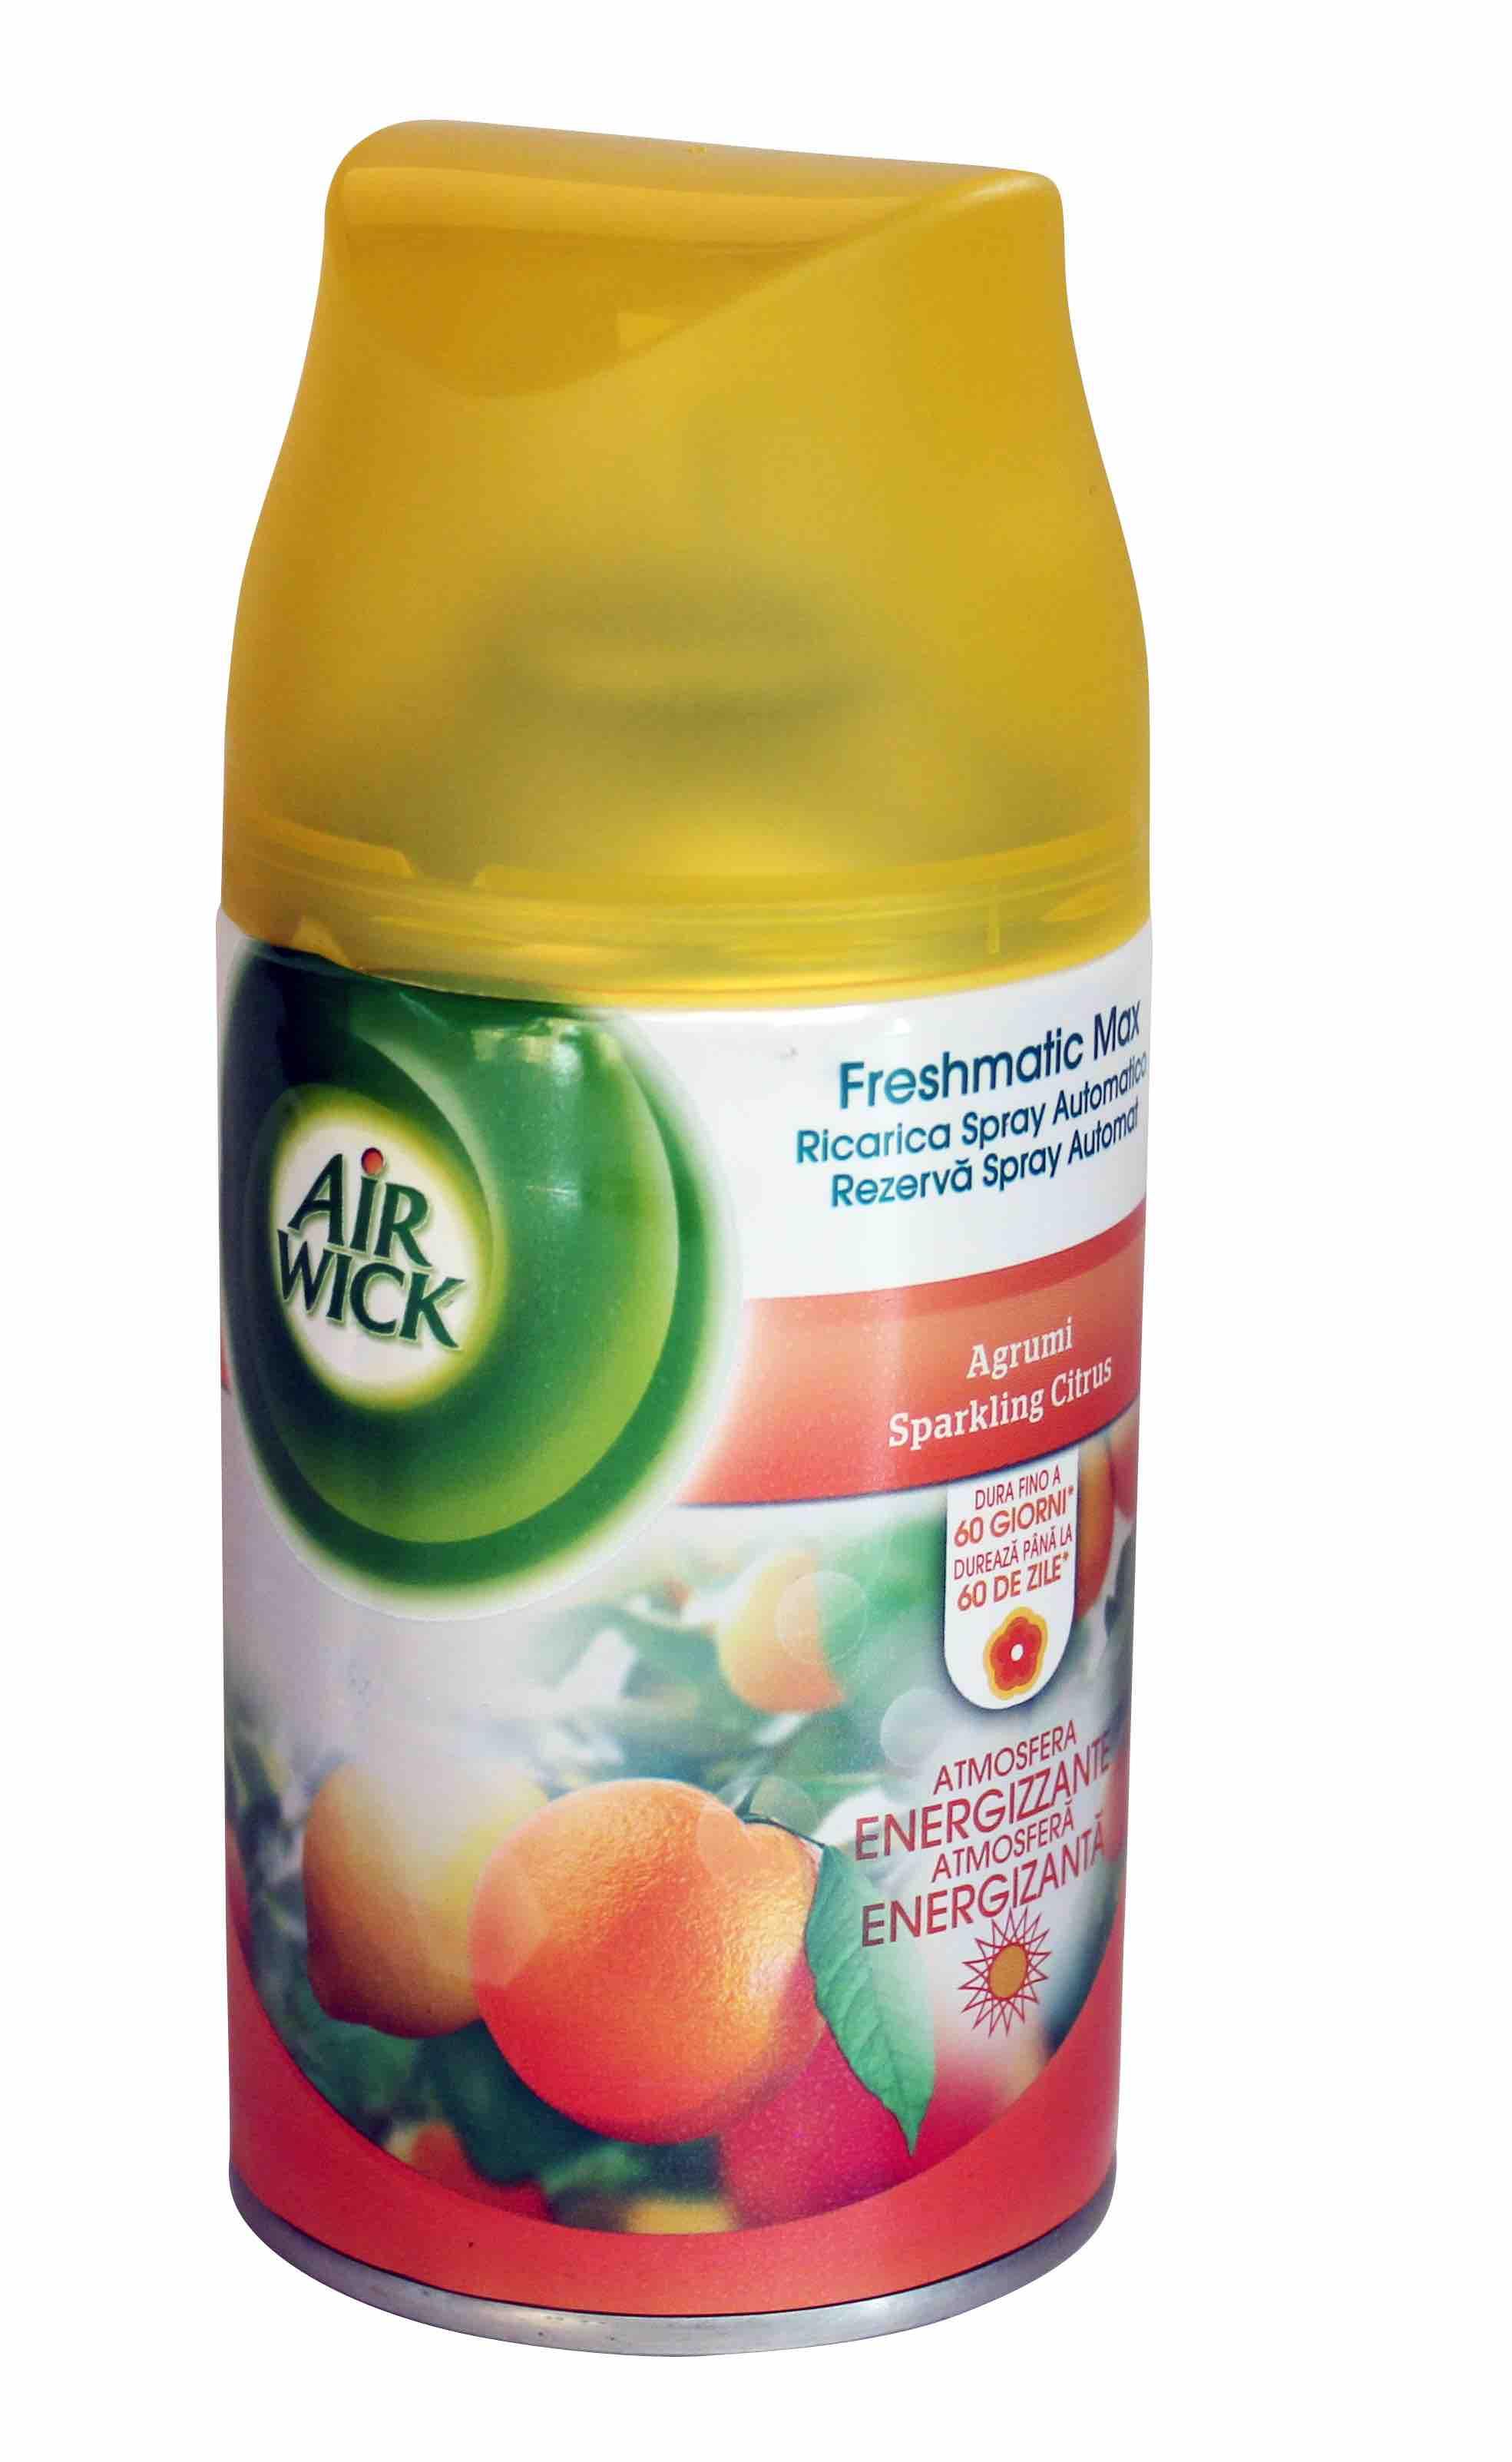 Air Wick Freshmatic Max 250ml Freshener Refill Sparkling Citrus